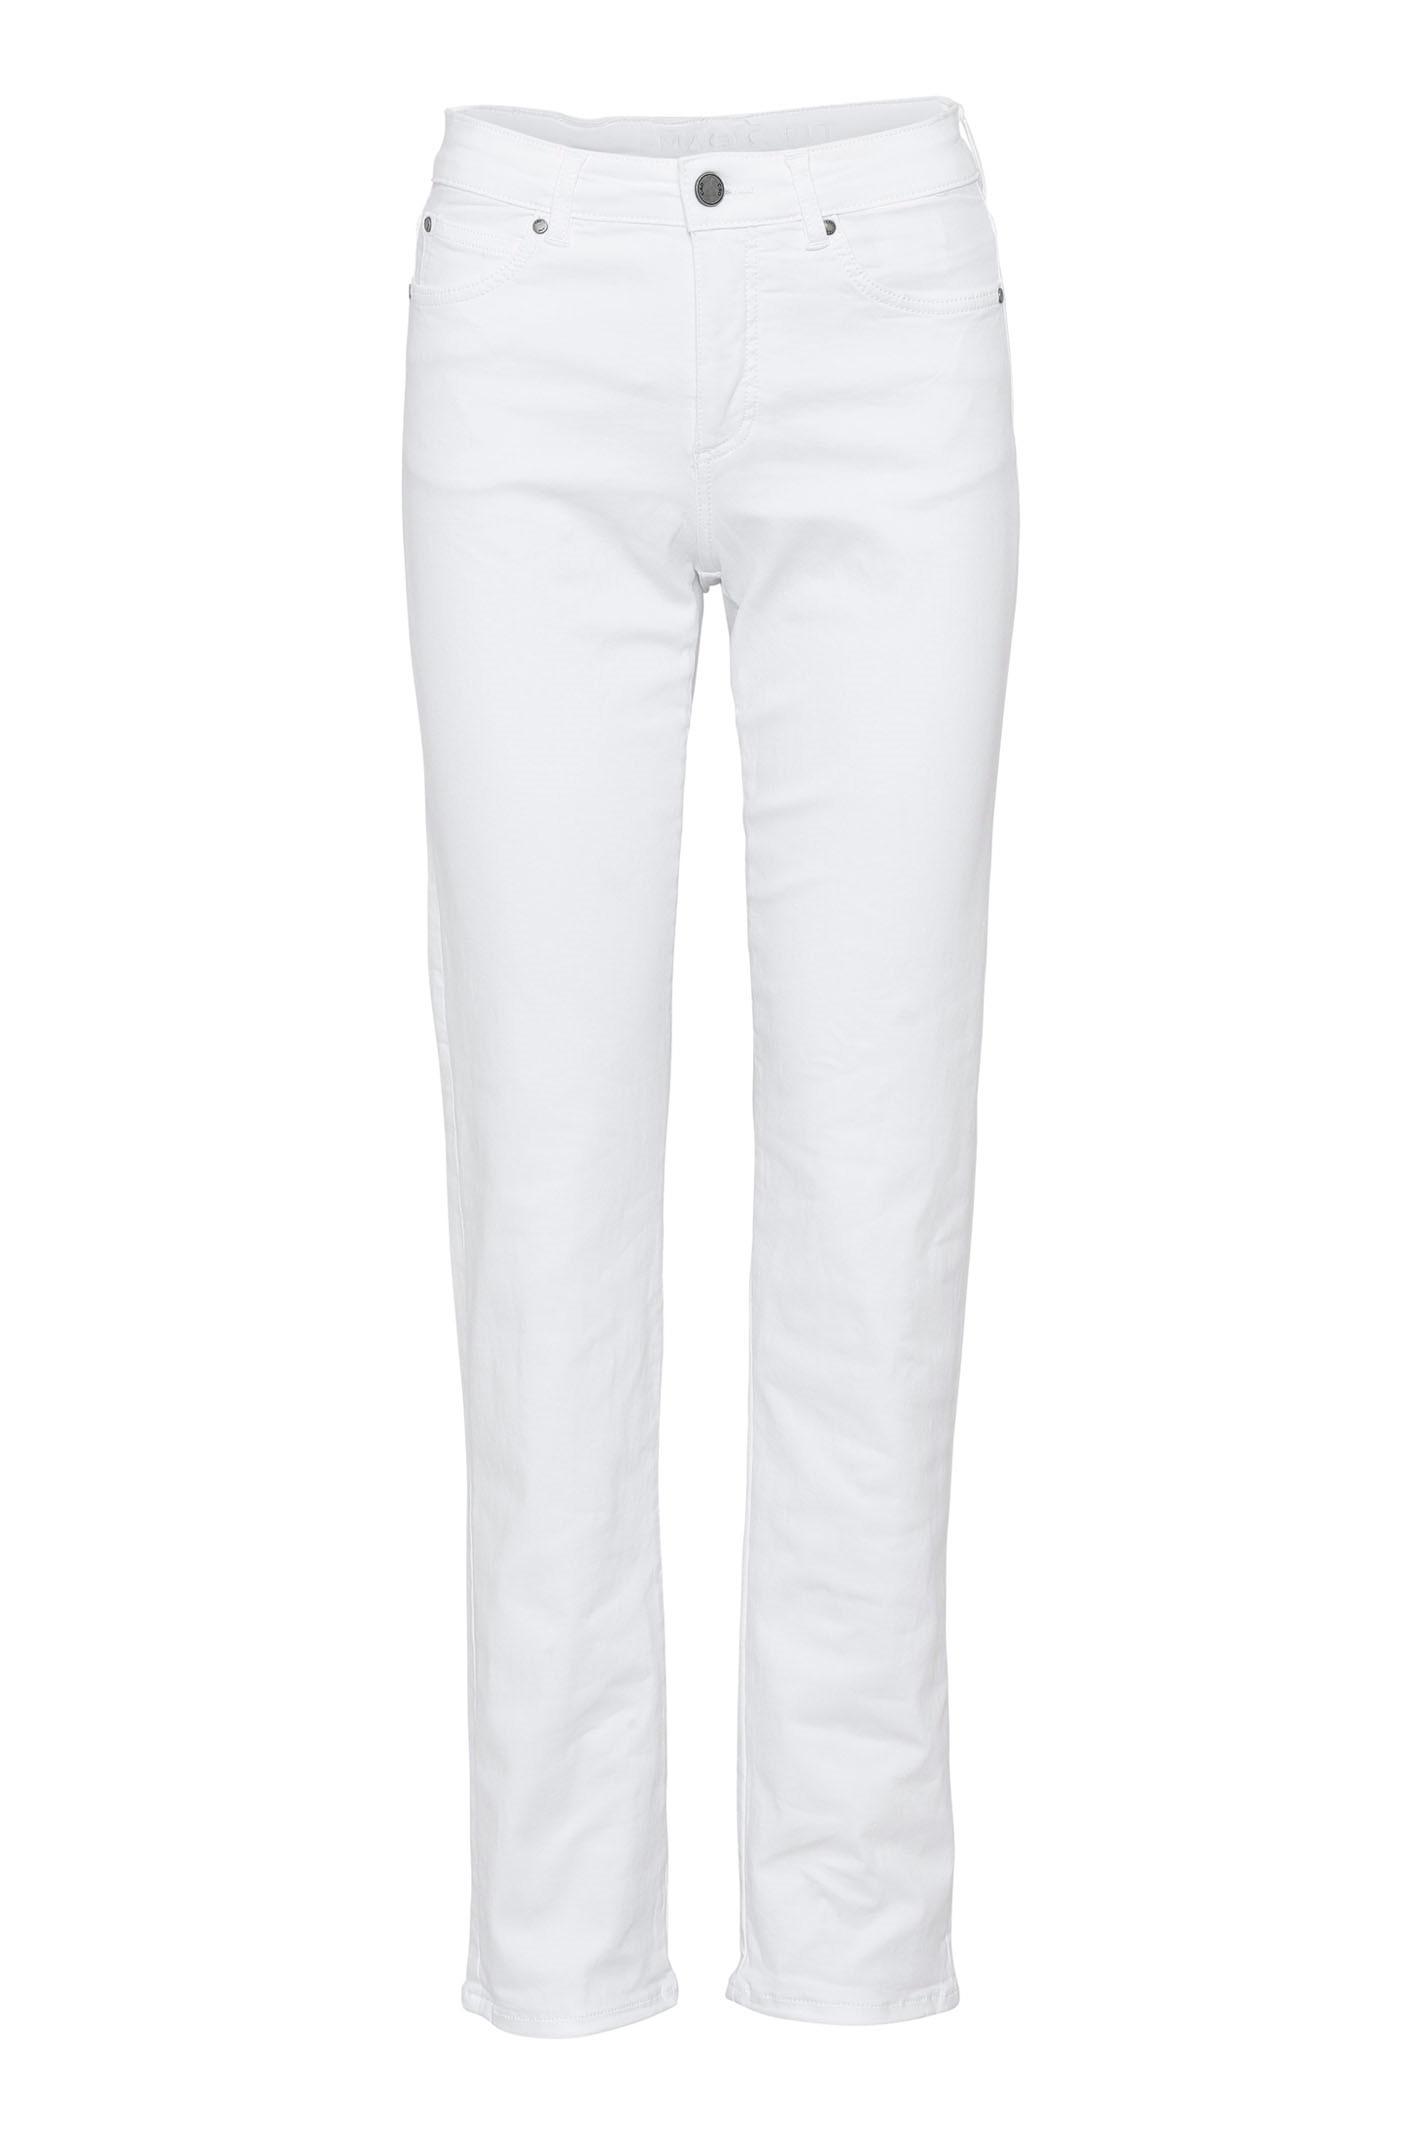 Cro tøj Shop Cro bukser online hos Bustedwoman Gratis